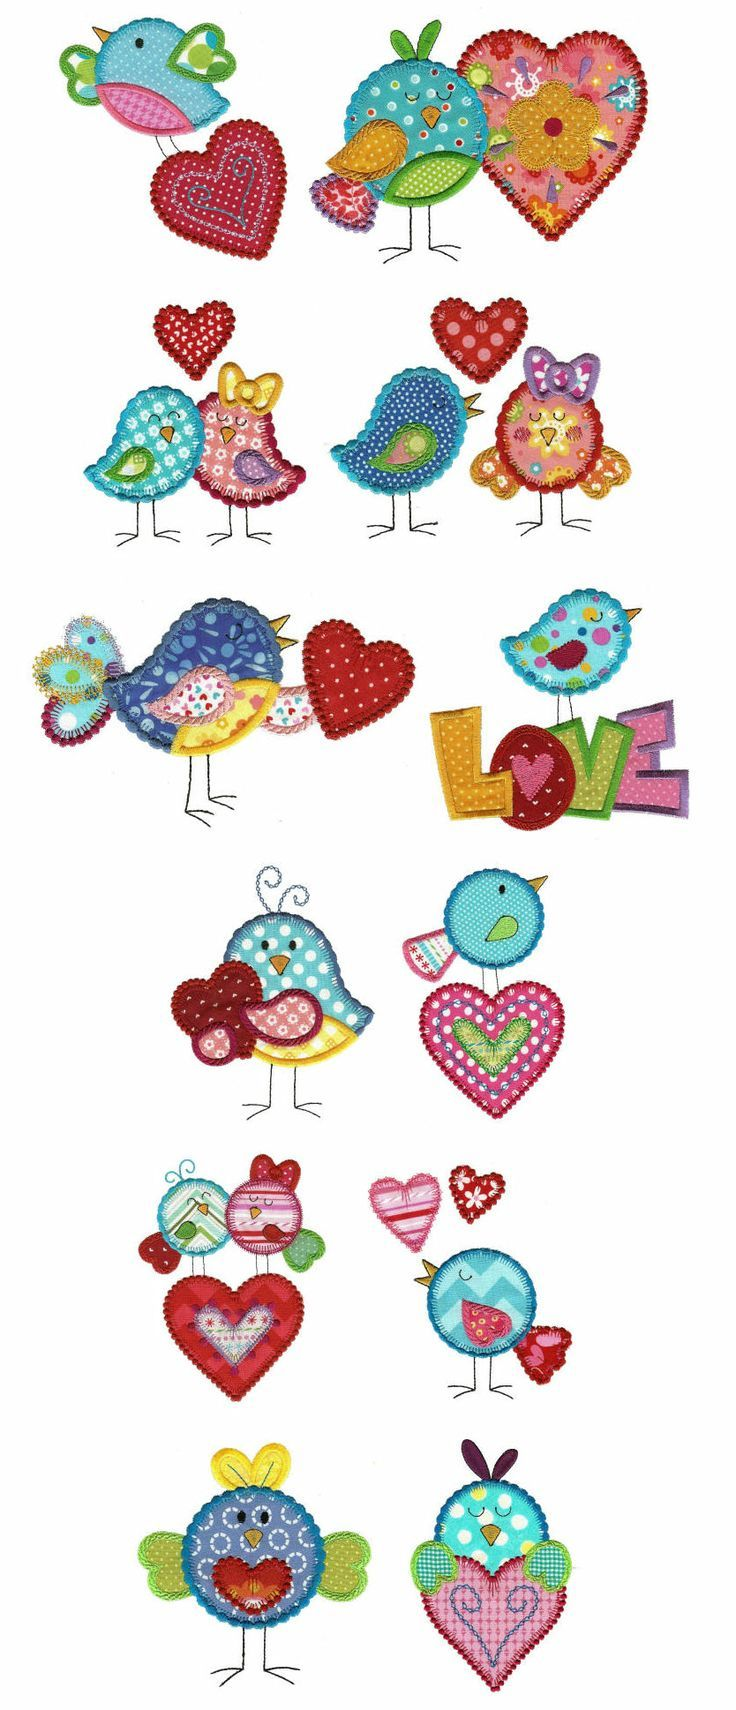 Embroidery Designs | Applique Machine Embroidery Designs | Love Birds Applique: